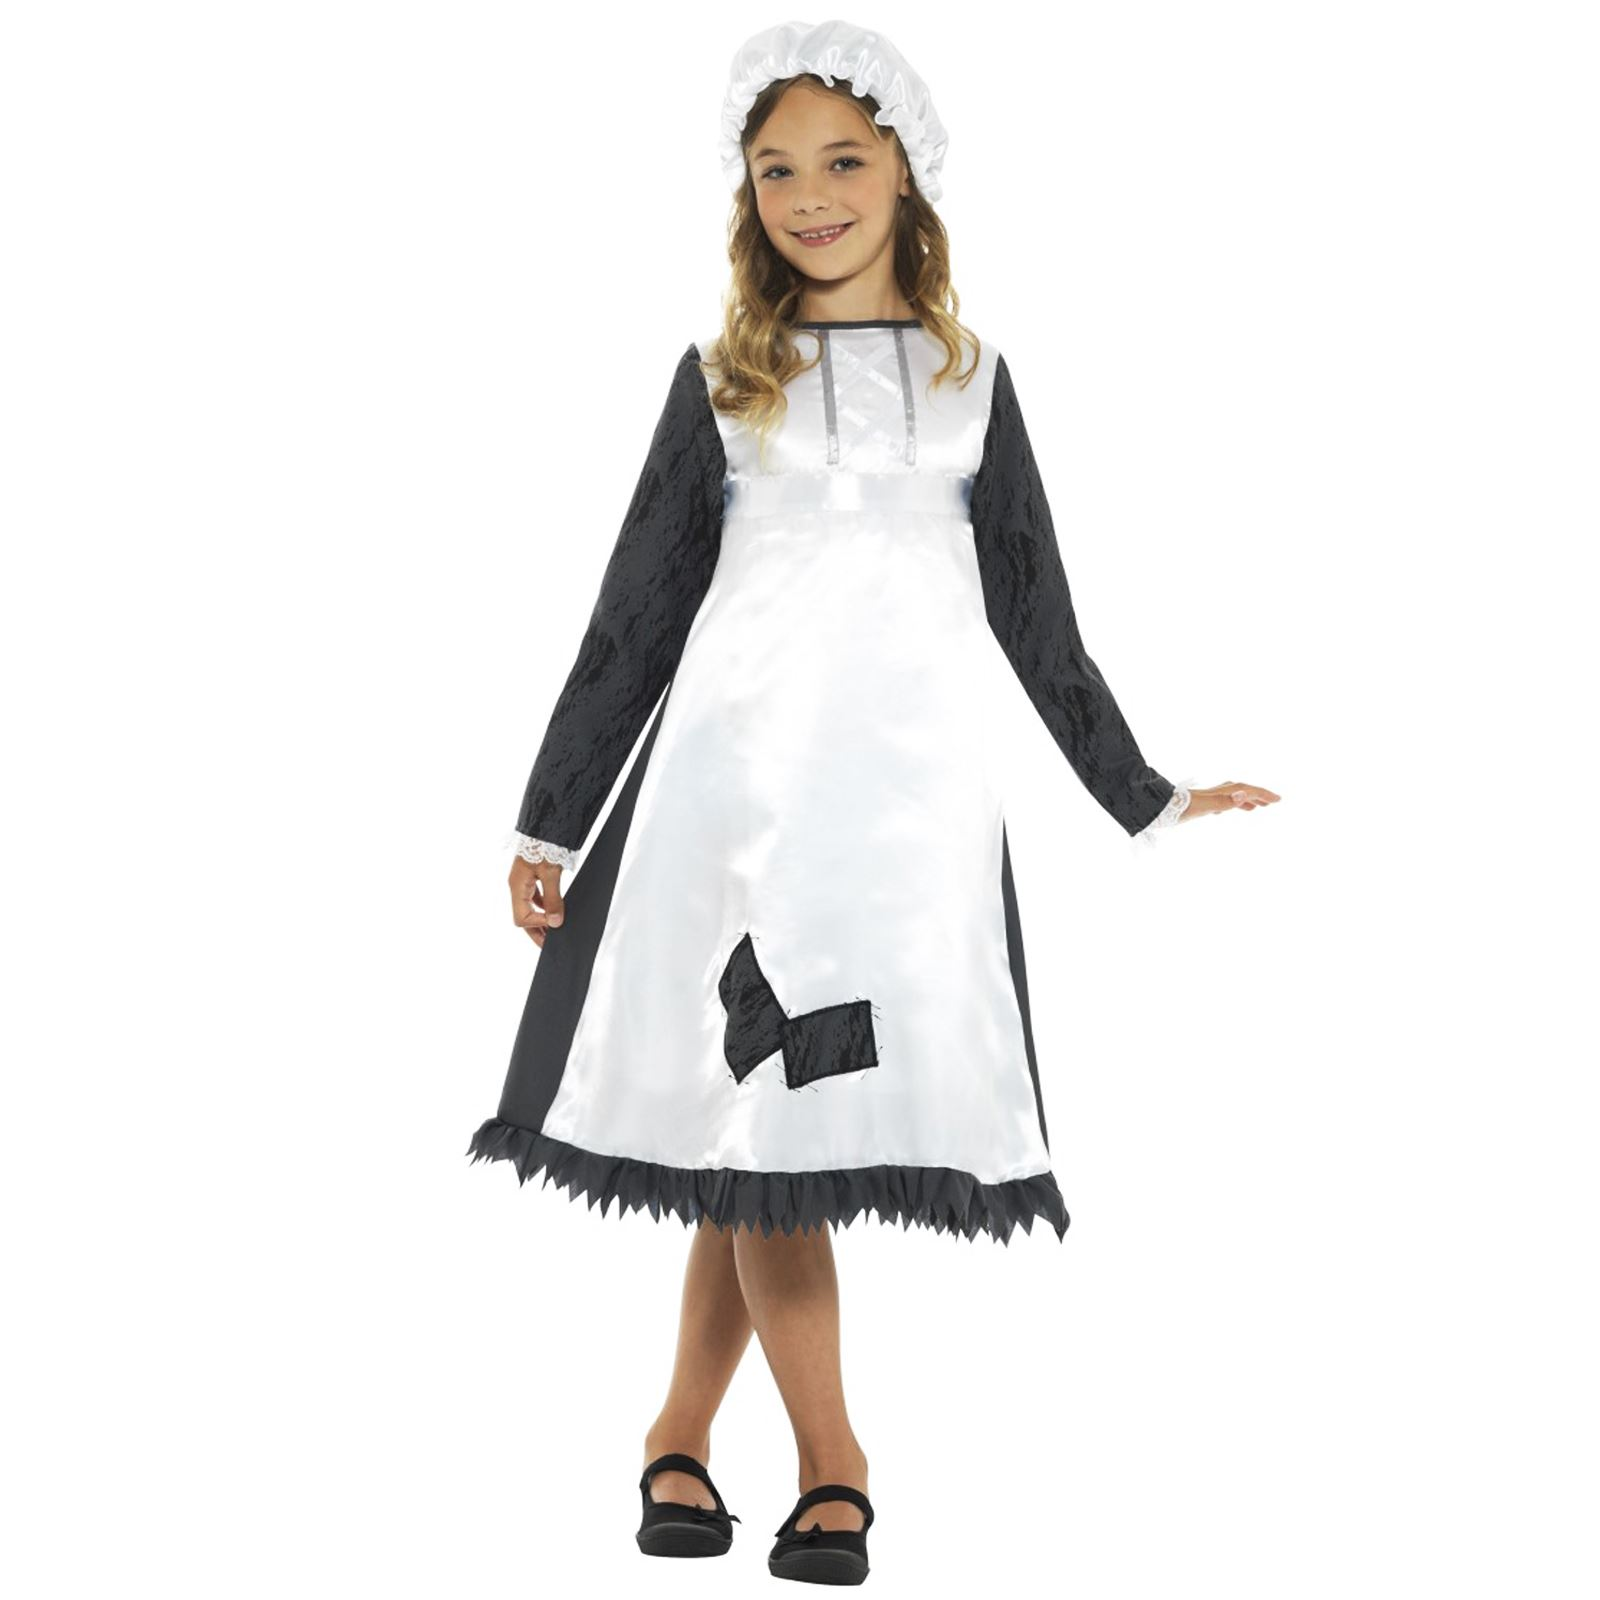 b394126e7e6ef Kids Girls Historical Poor Victorian Maid Pauper Fancy Dress Book ...